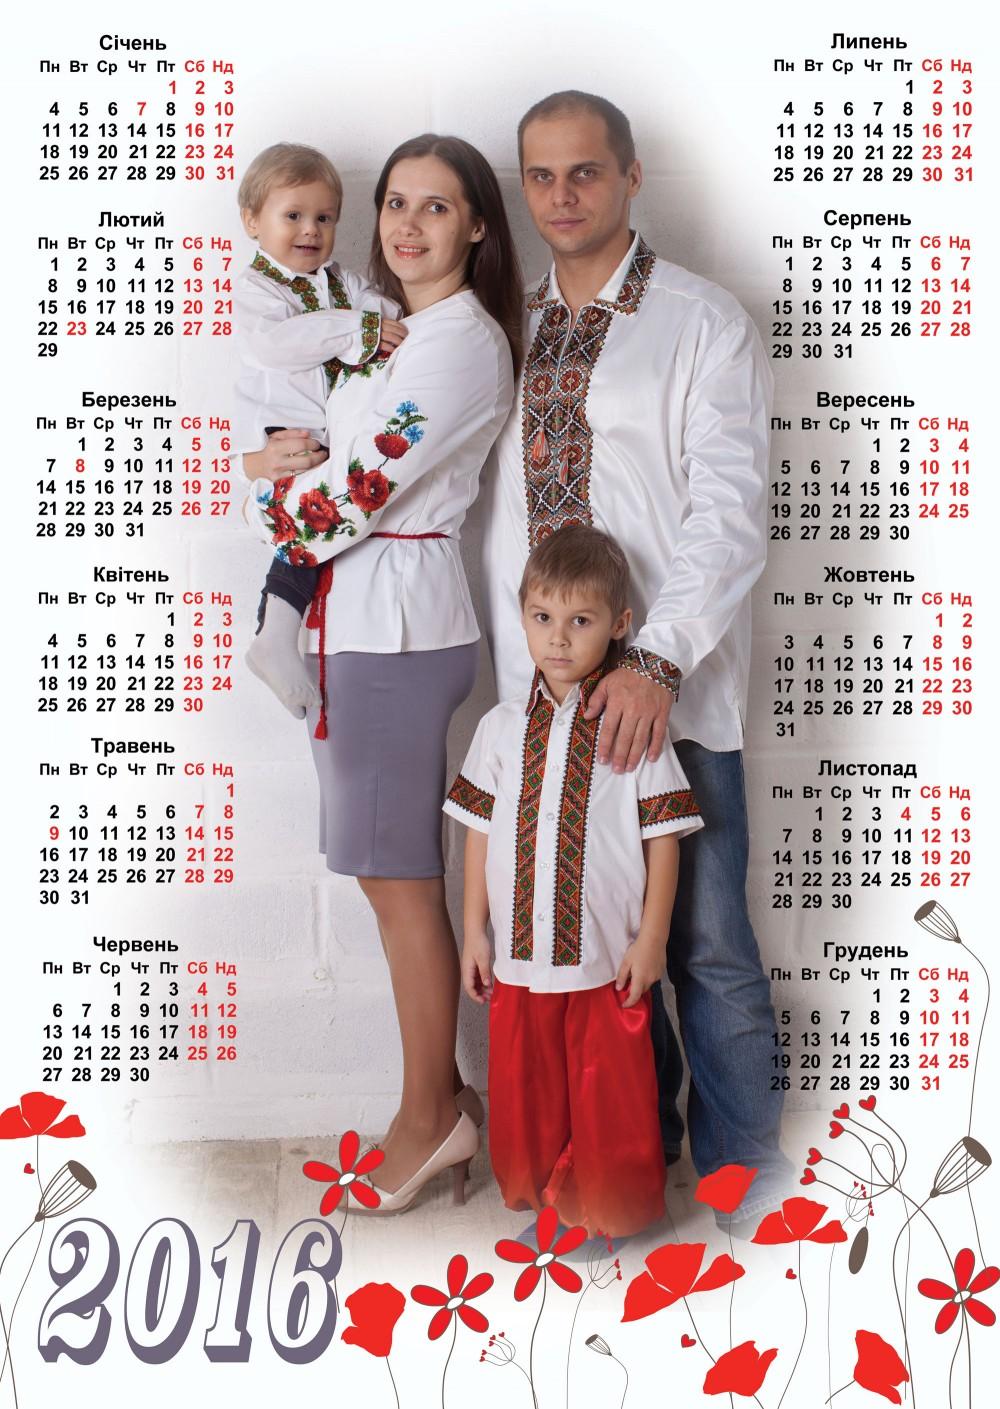 kalendar-vyshyvka